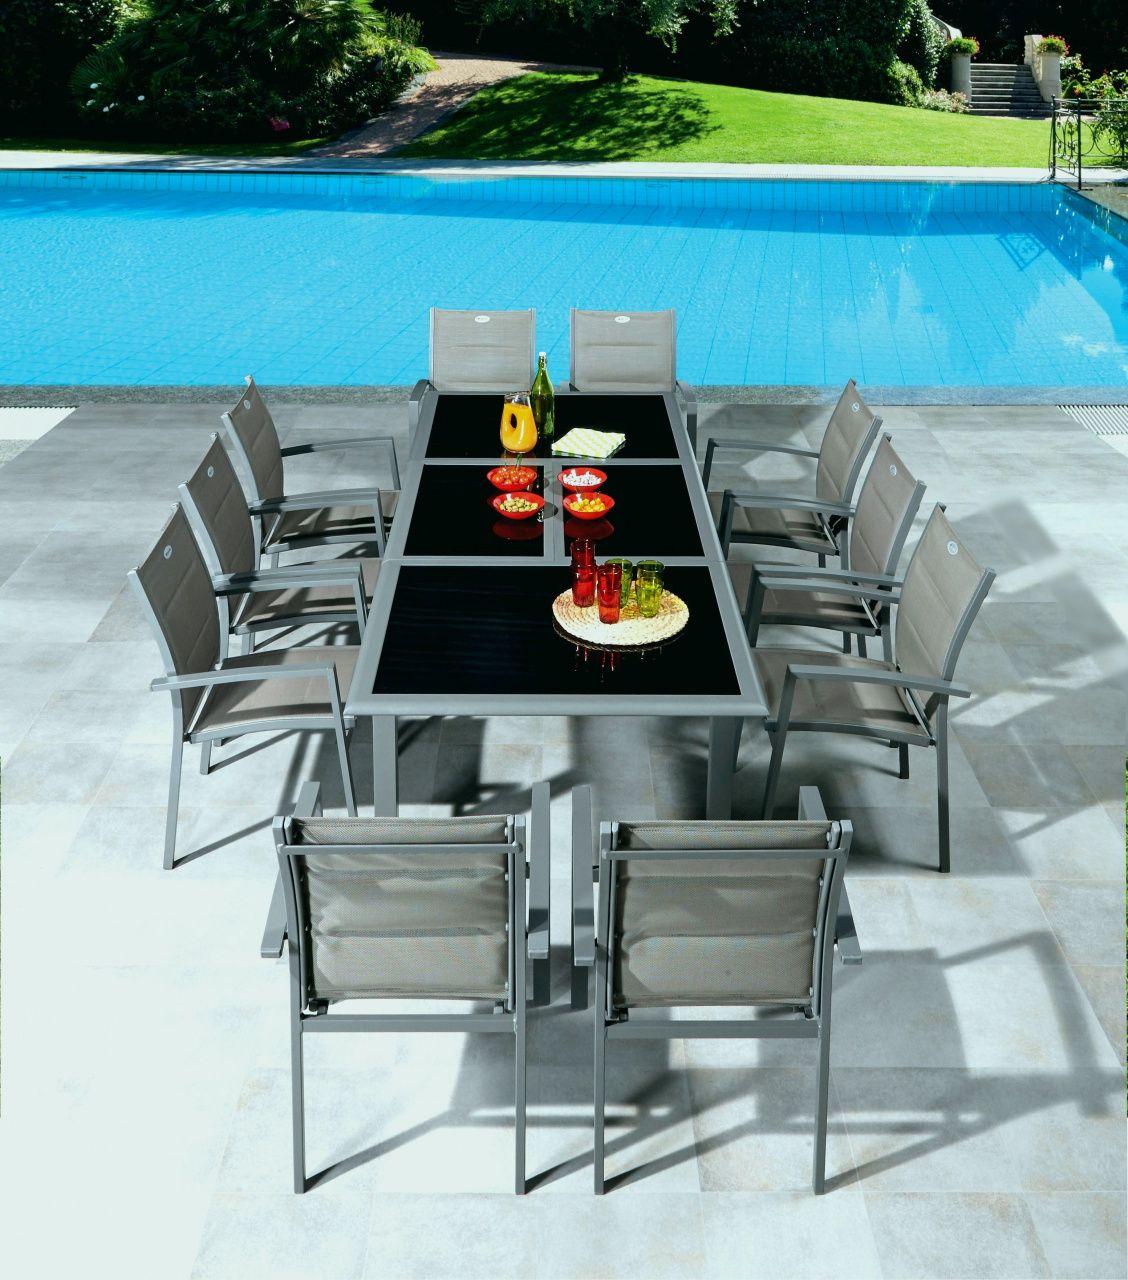 55 Salon De Jardin Centrakor | Transforming Furniture ... encequiconcerne Table De Jardin Centrakor